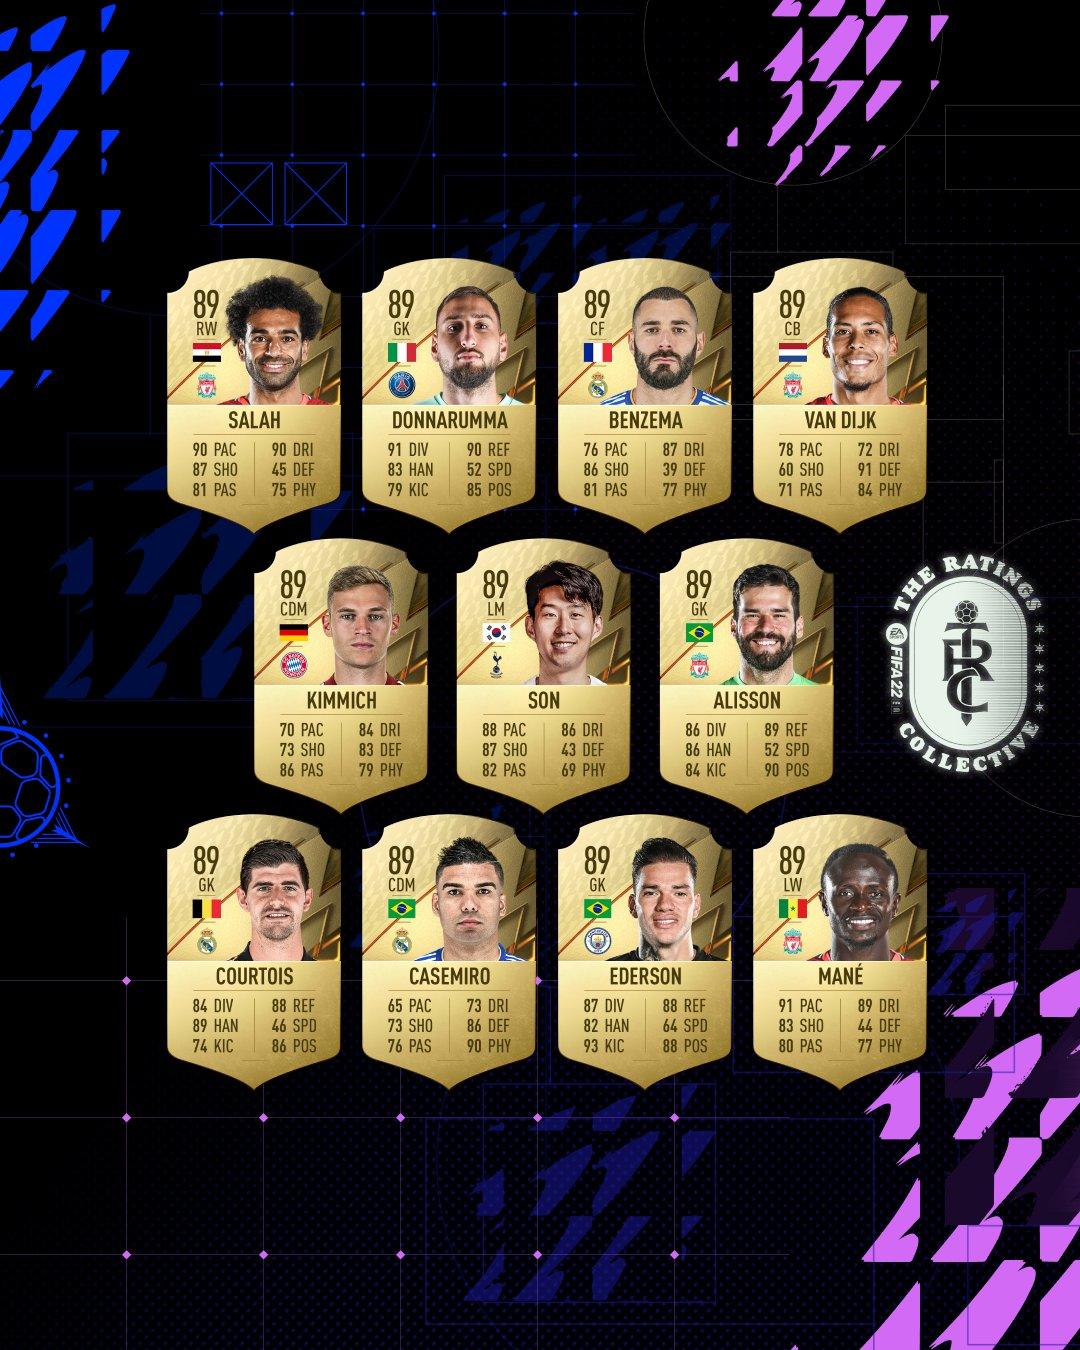 《FIFA 22》球员排名公布 梅西仍然位居第一插图5